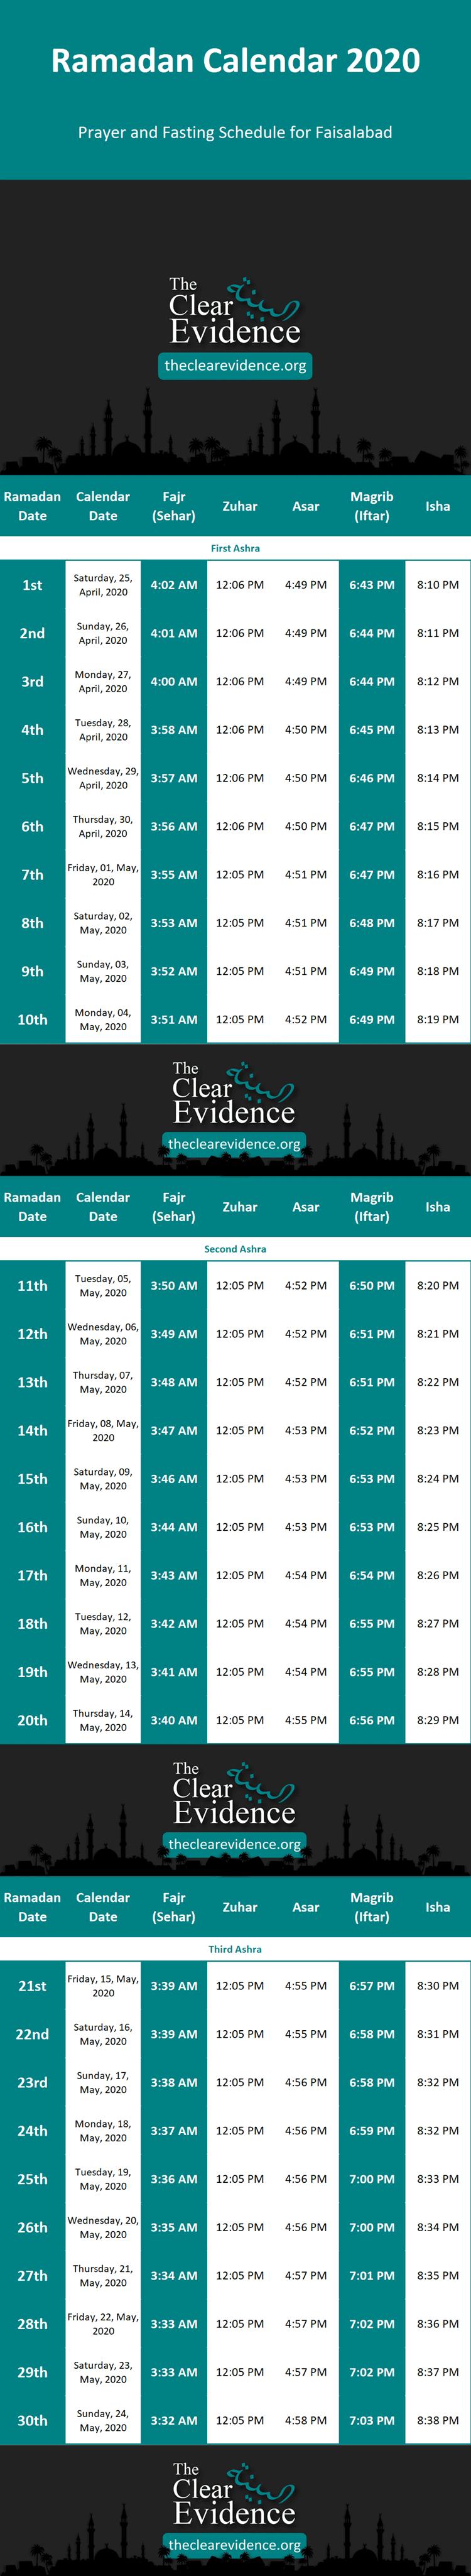 Prayer (Salah/Namaz) and Fasting (Sawm/Rozah) (Suhur/Sehri) (Fatur/Iftar) Schedule in Ramadan 2020 for Faisalabad, Pakistan